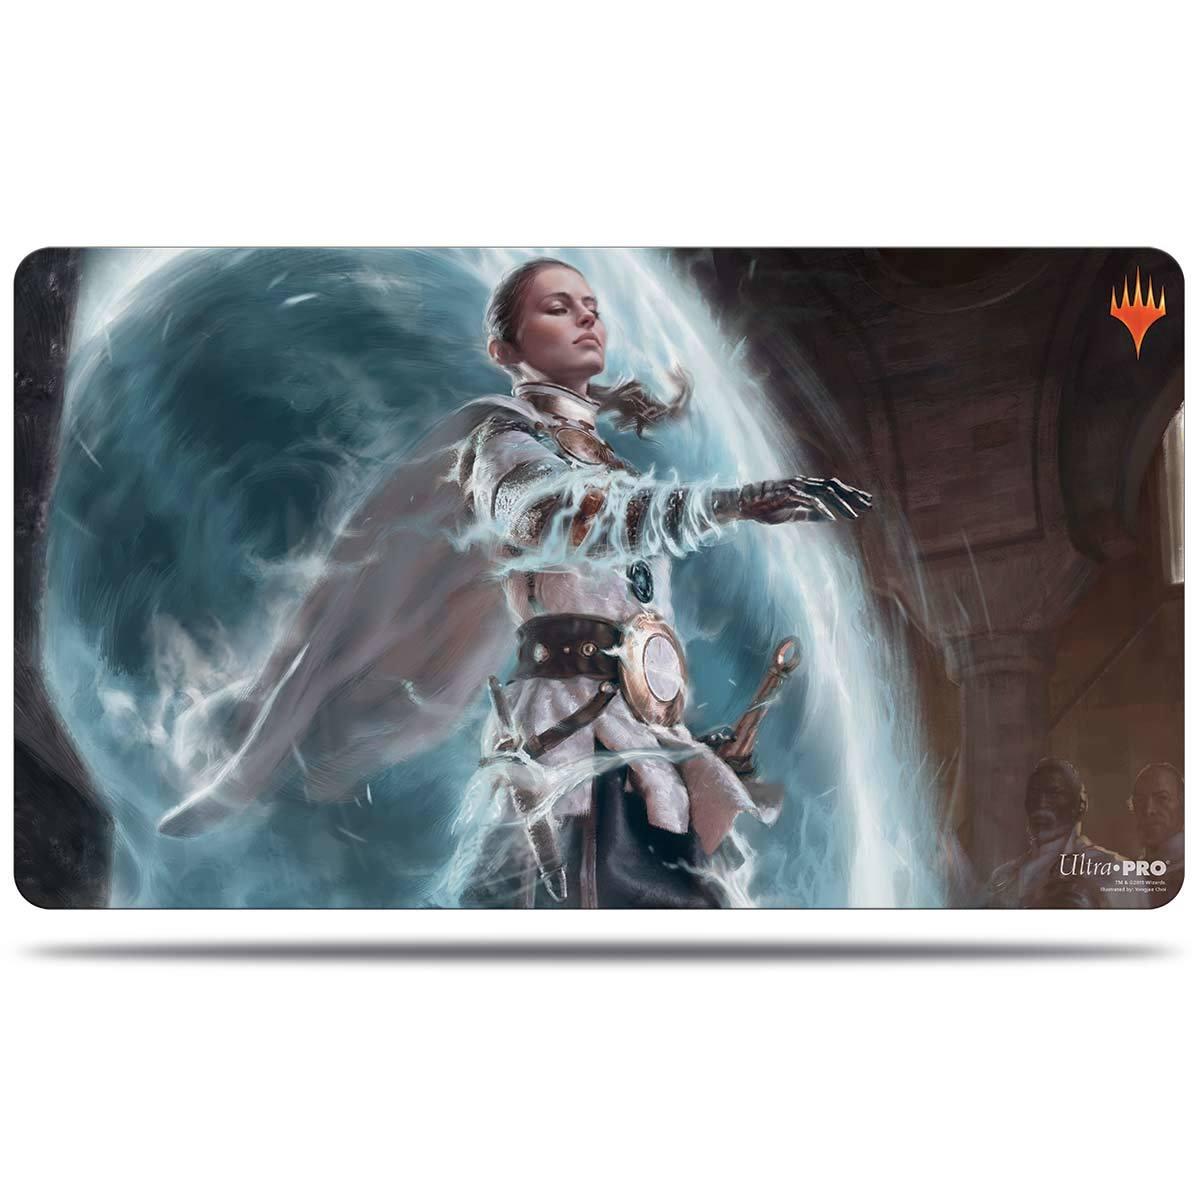 Ultra Pro: Magic The Gathering Playmat: Throne of Eldraine Worthy Knight image